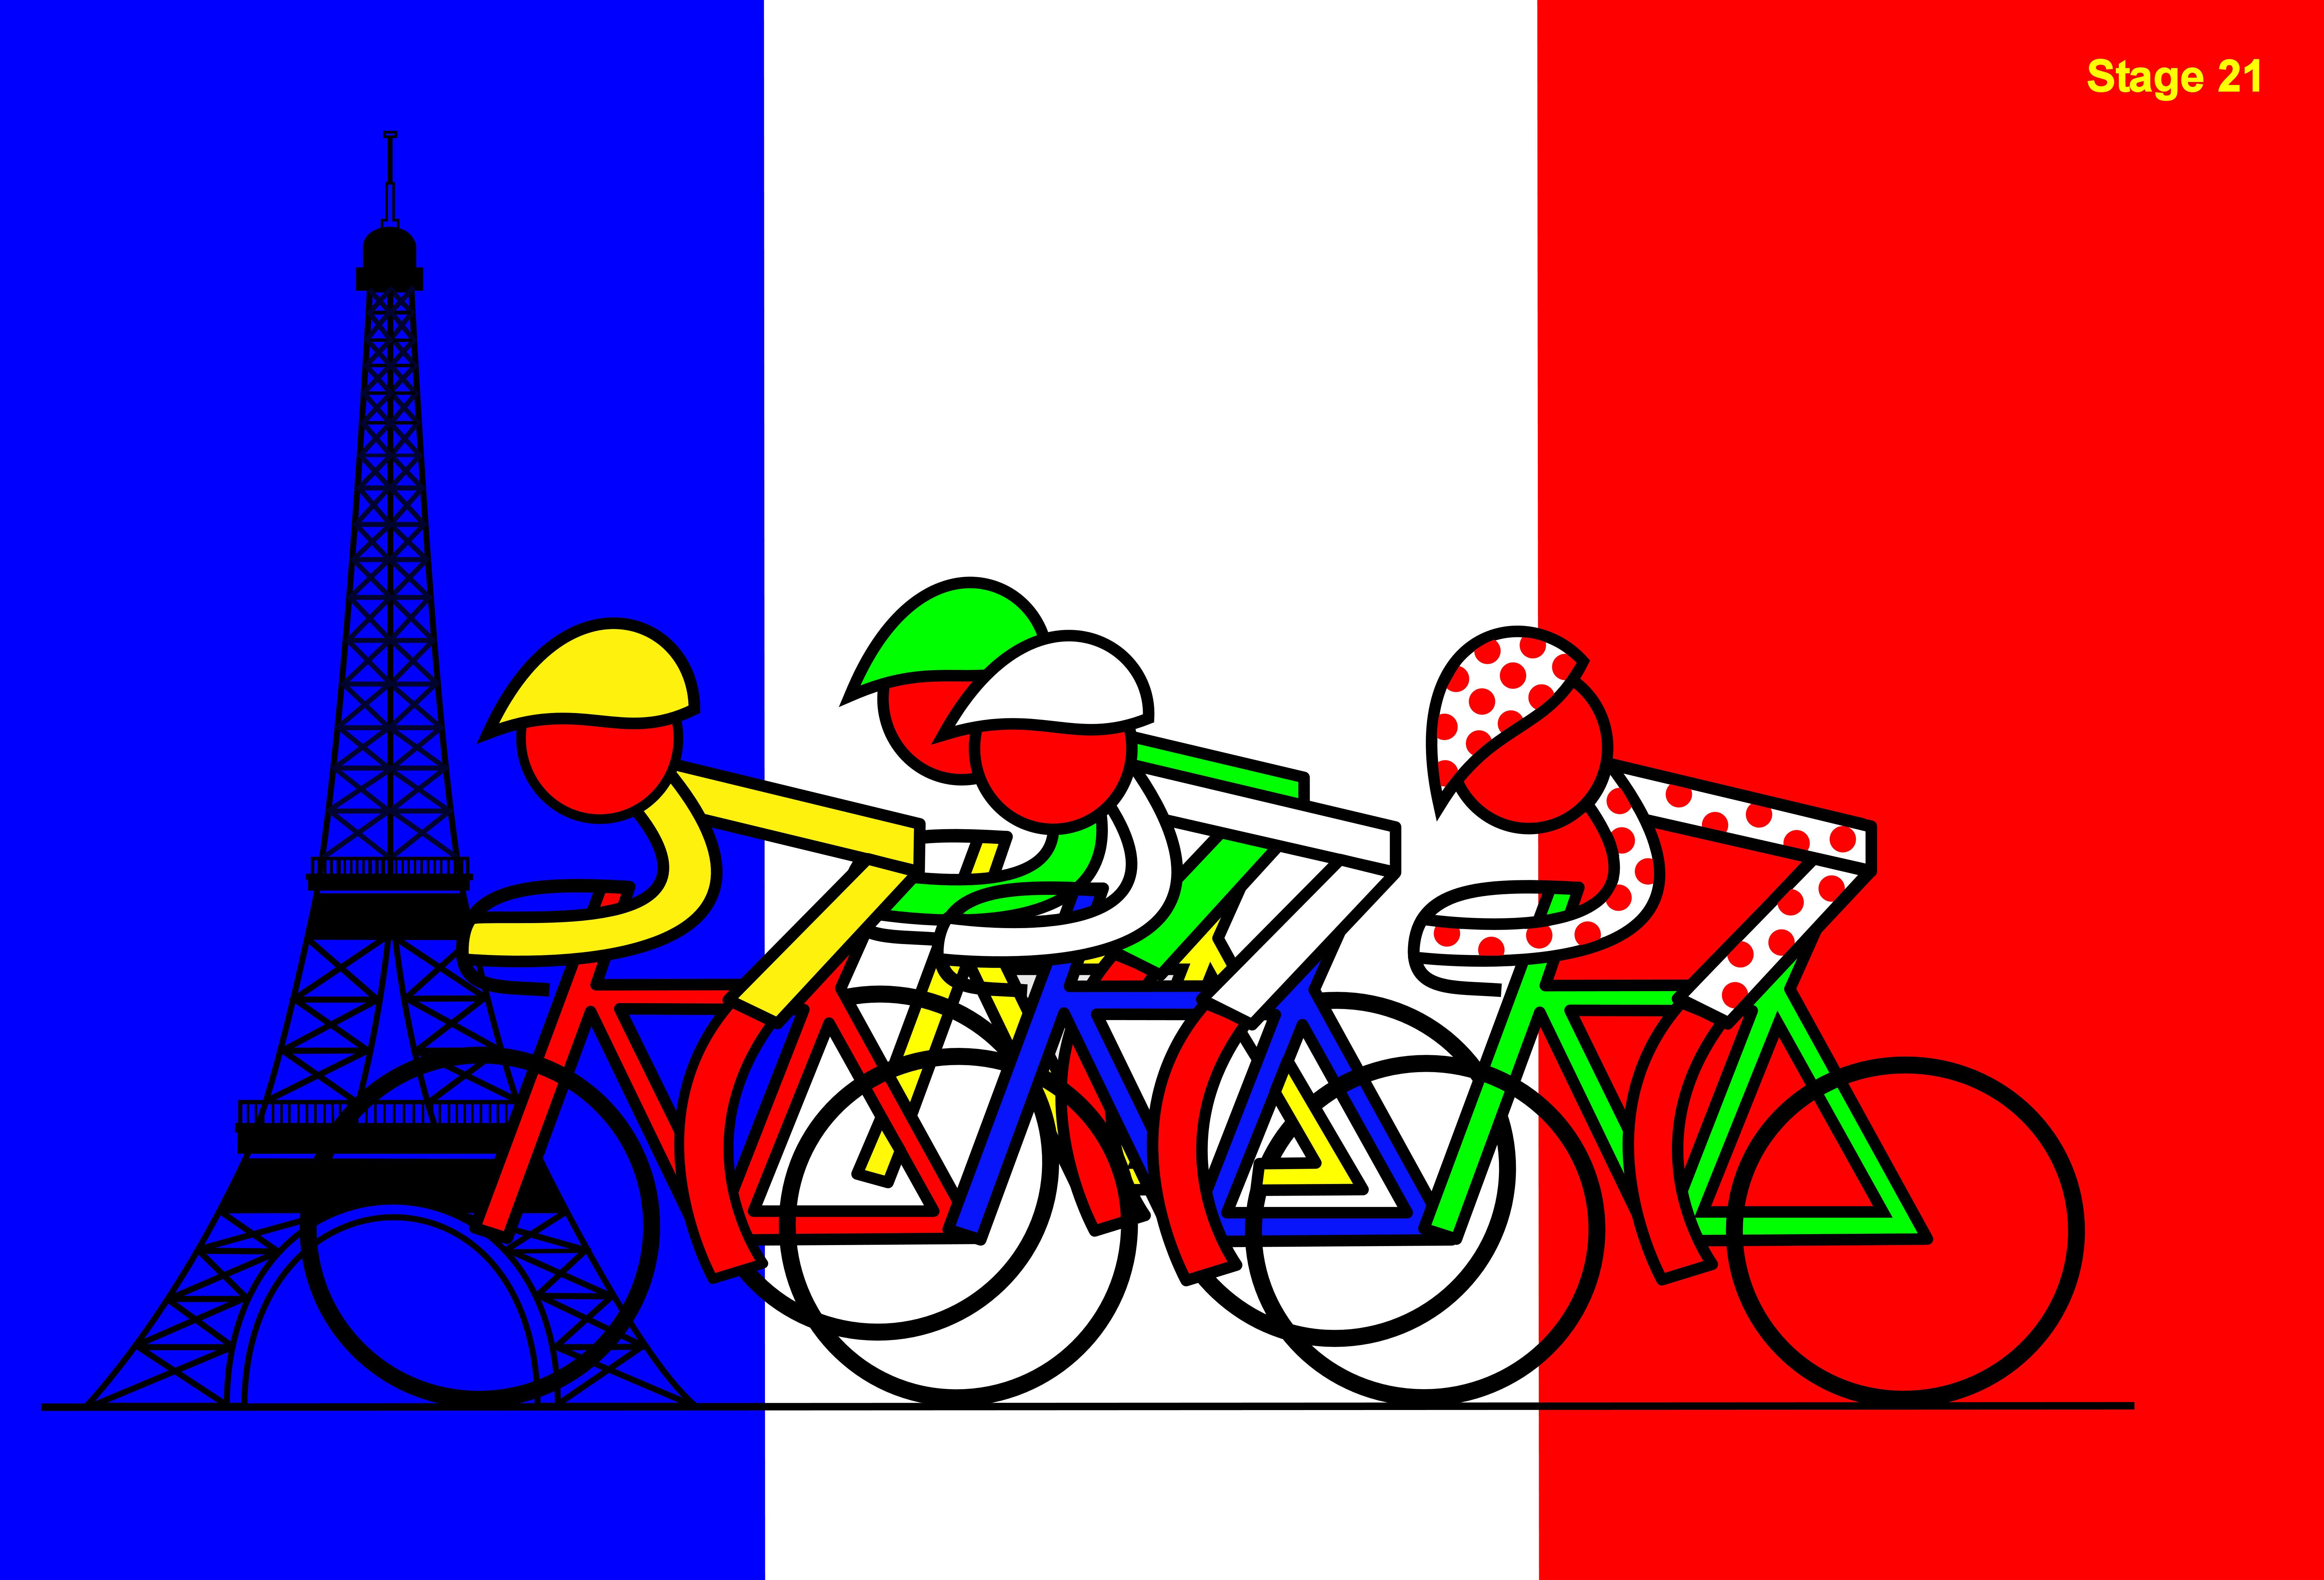 Évry, Paris                                           Champs-Élysées, stage 21, July                                           27th, Paris, The Eiffel Tower,                                           Paris, Vincenzo NIBALI, Italy,                                           ASTANA PRO TEAM, ASTANA, Peter                                           SAGAN, Slovakia, CANNONDALE,                                           Thibaut PINOT, FRANCE, FDJ.FR,                                           Rafal MAJKA, POLAND,                                           TINKOFF-SAXO, Tour de France                                           2014, tour de france, Évry,                                           Paris Champs-Élysées, l'étape                                           21, le 27 Juillet, Paris, La                                           Tour Eiffel, Paris, Vincenzo                                           NIBALI, Italie, ASTANA PRO                                           TEAM, ASTANA, Peter Sagan,                                           Slovaquie, CANNONDALE, Thibaut                                           Pinot, FRANCE, FDJ.FR, Rafal                                           MAJKA , POLOGNE, TINKOFF-SAXO,                                           Tour de France 2014, Tour de                                           France